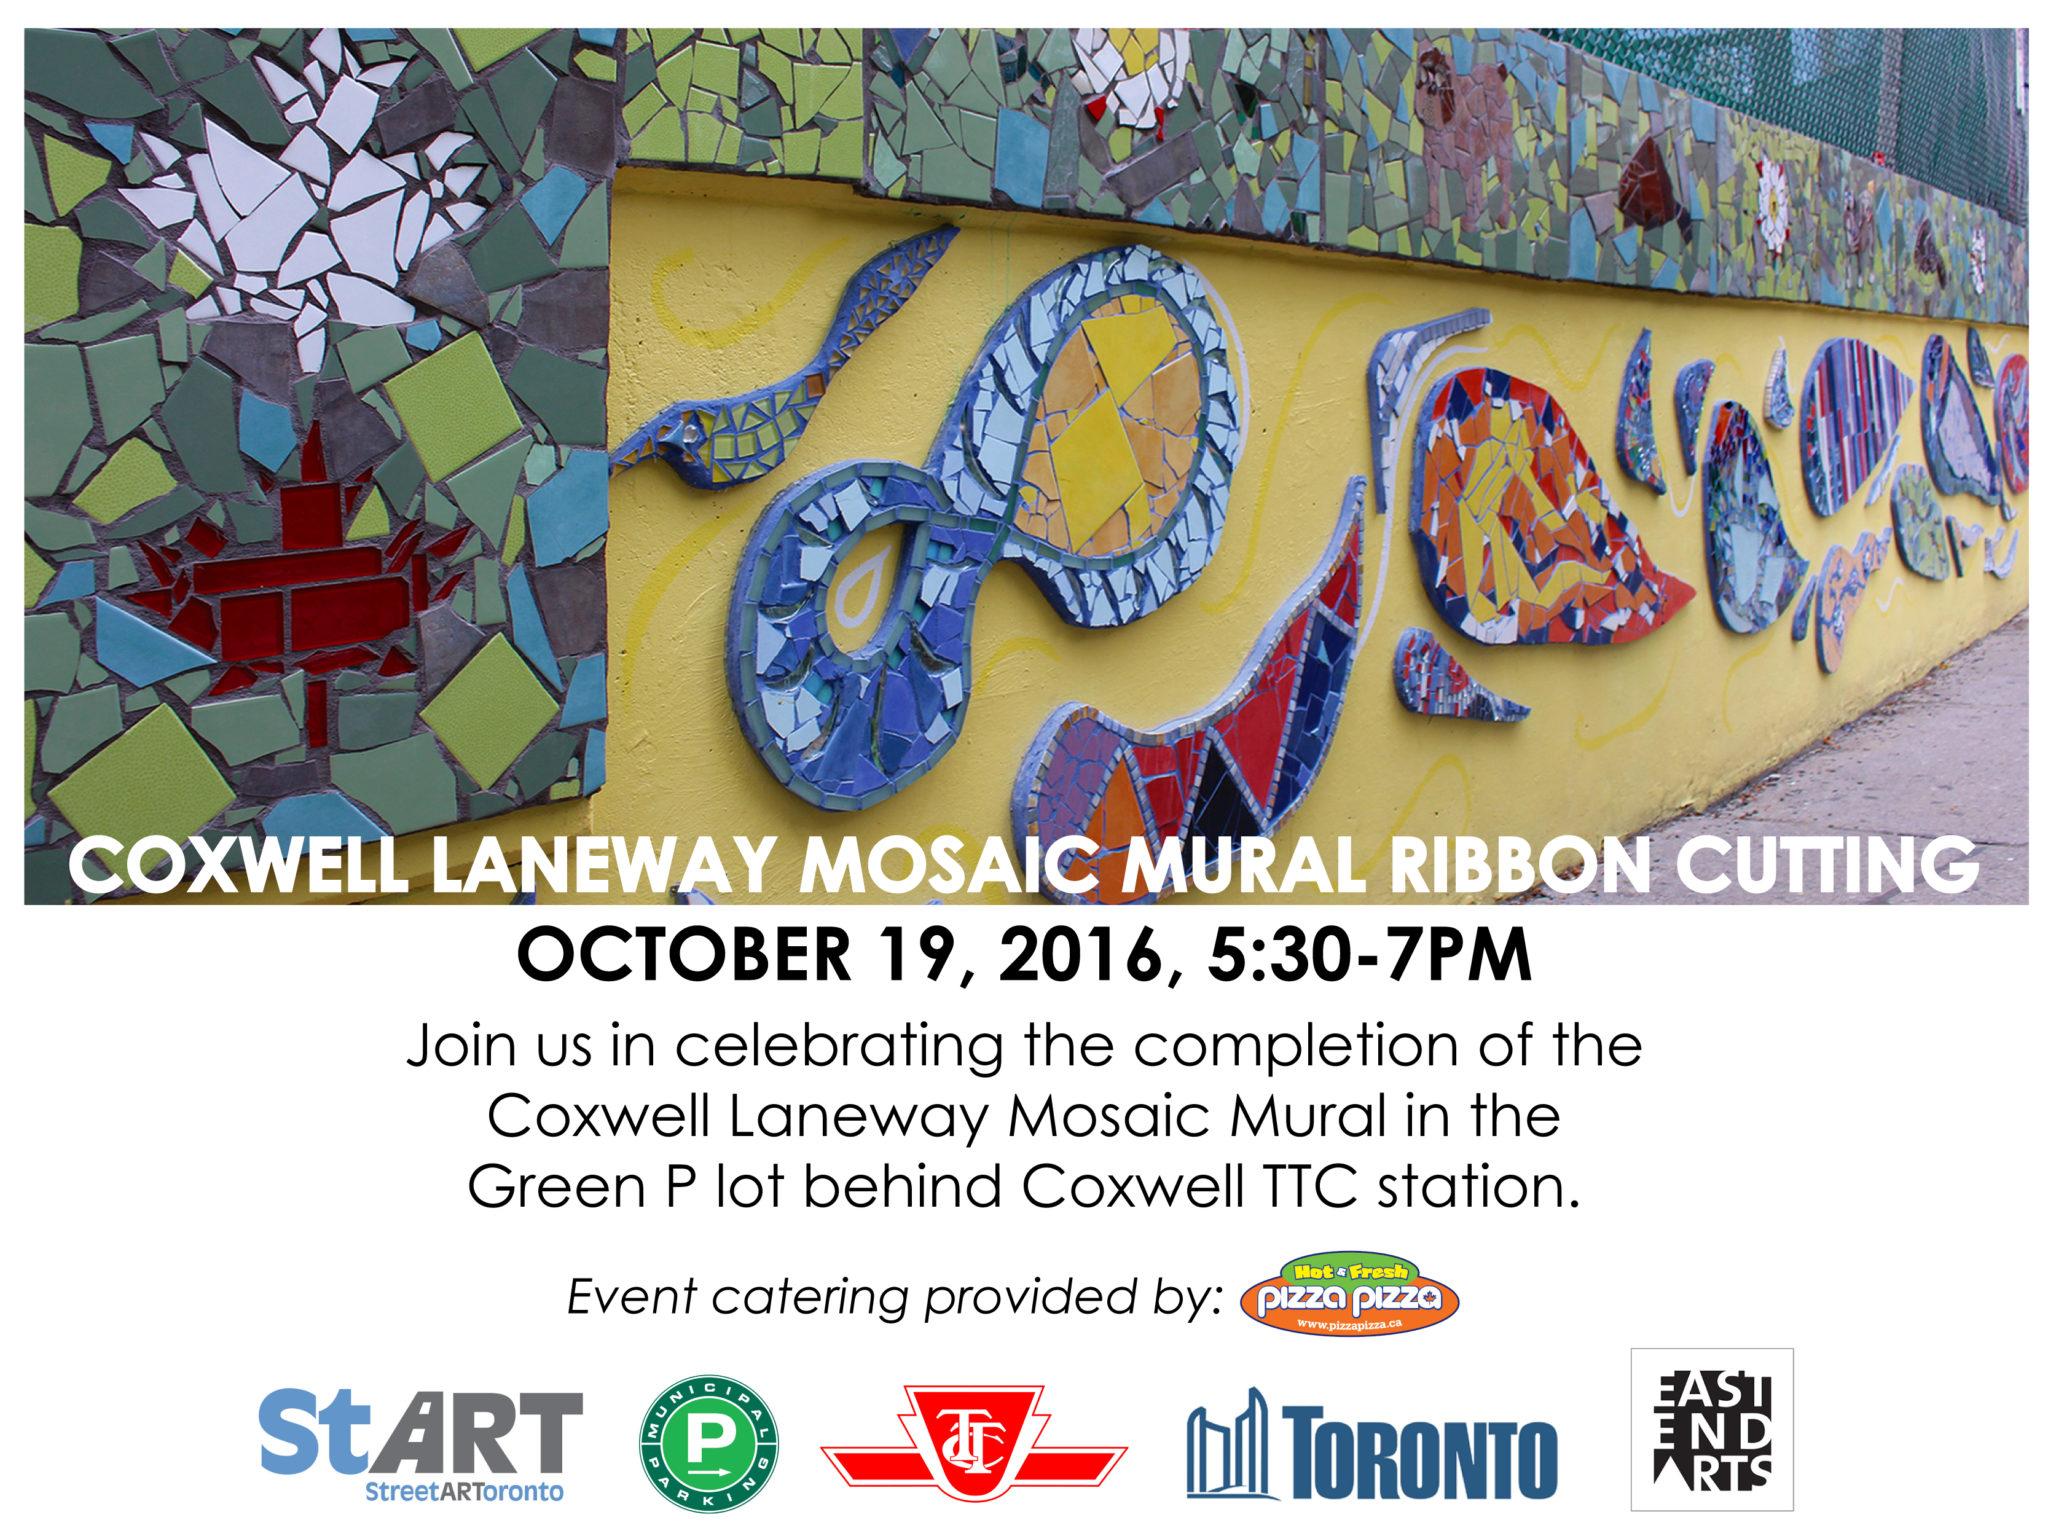 coxwell-laneway-mosaic-mural-ribbon-cutting_oct-19